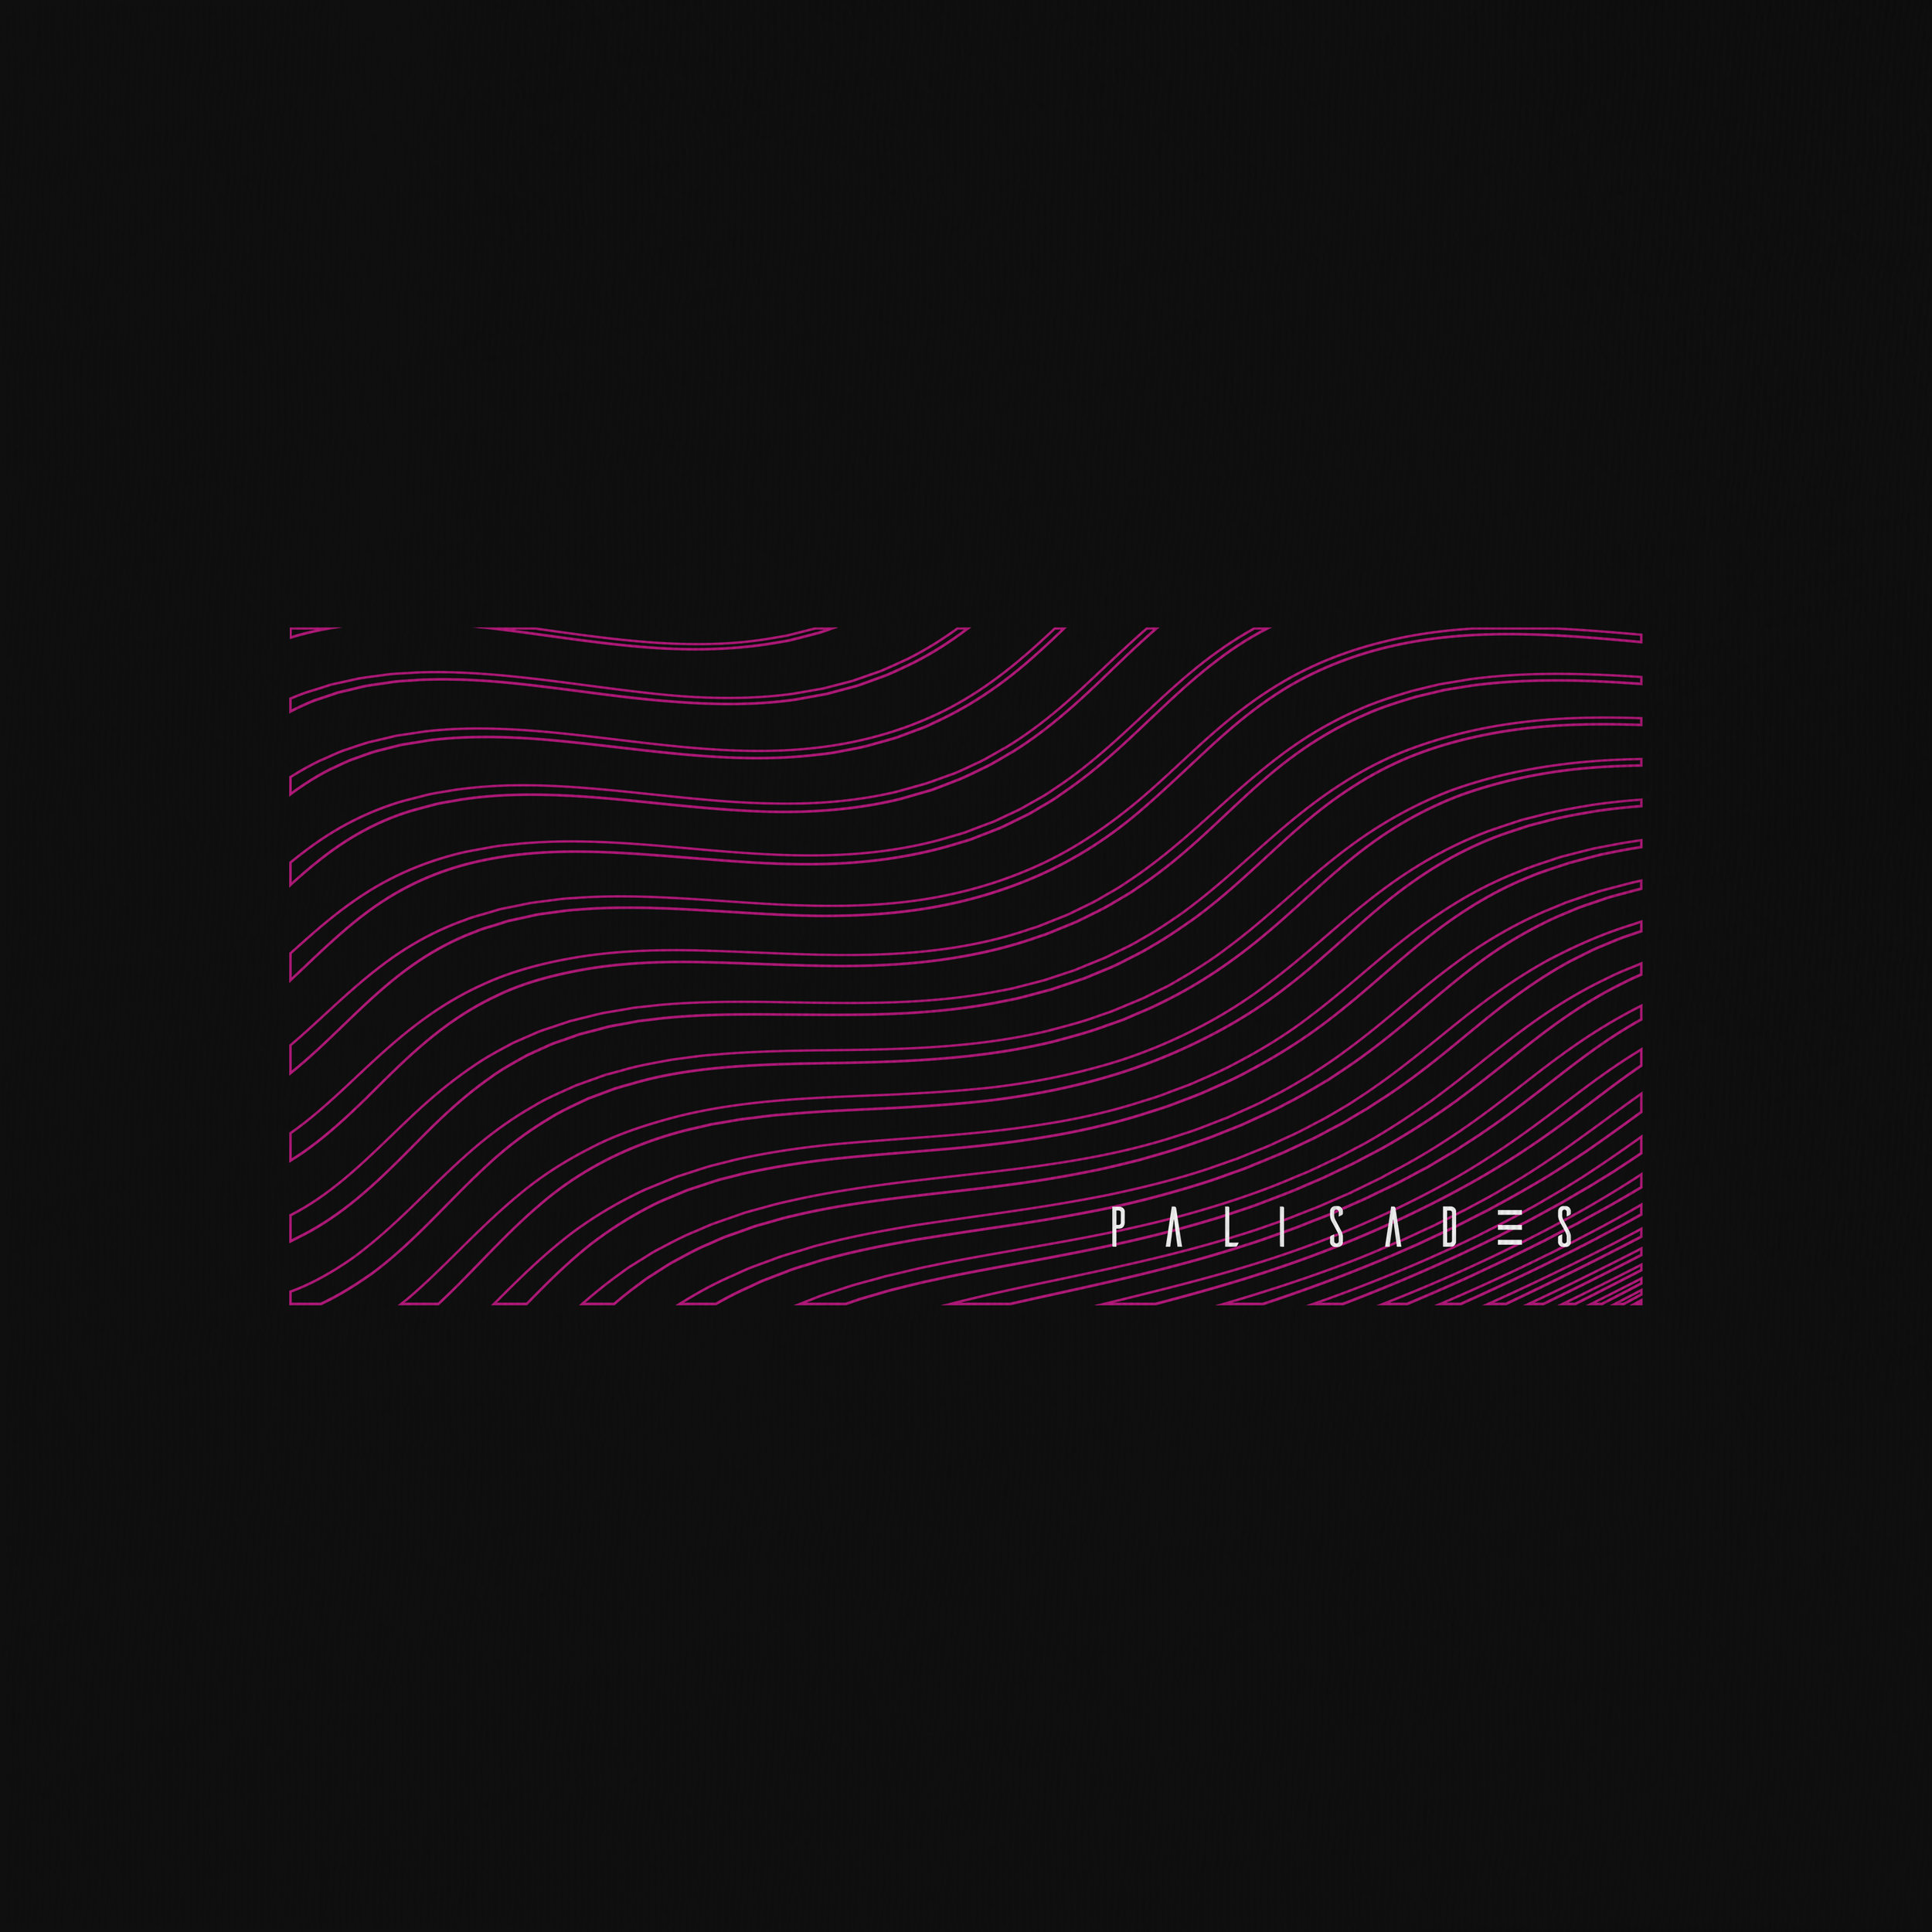 palisades-snake-jar-front.jpg